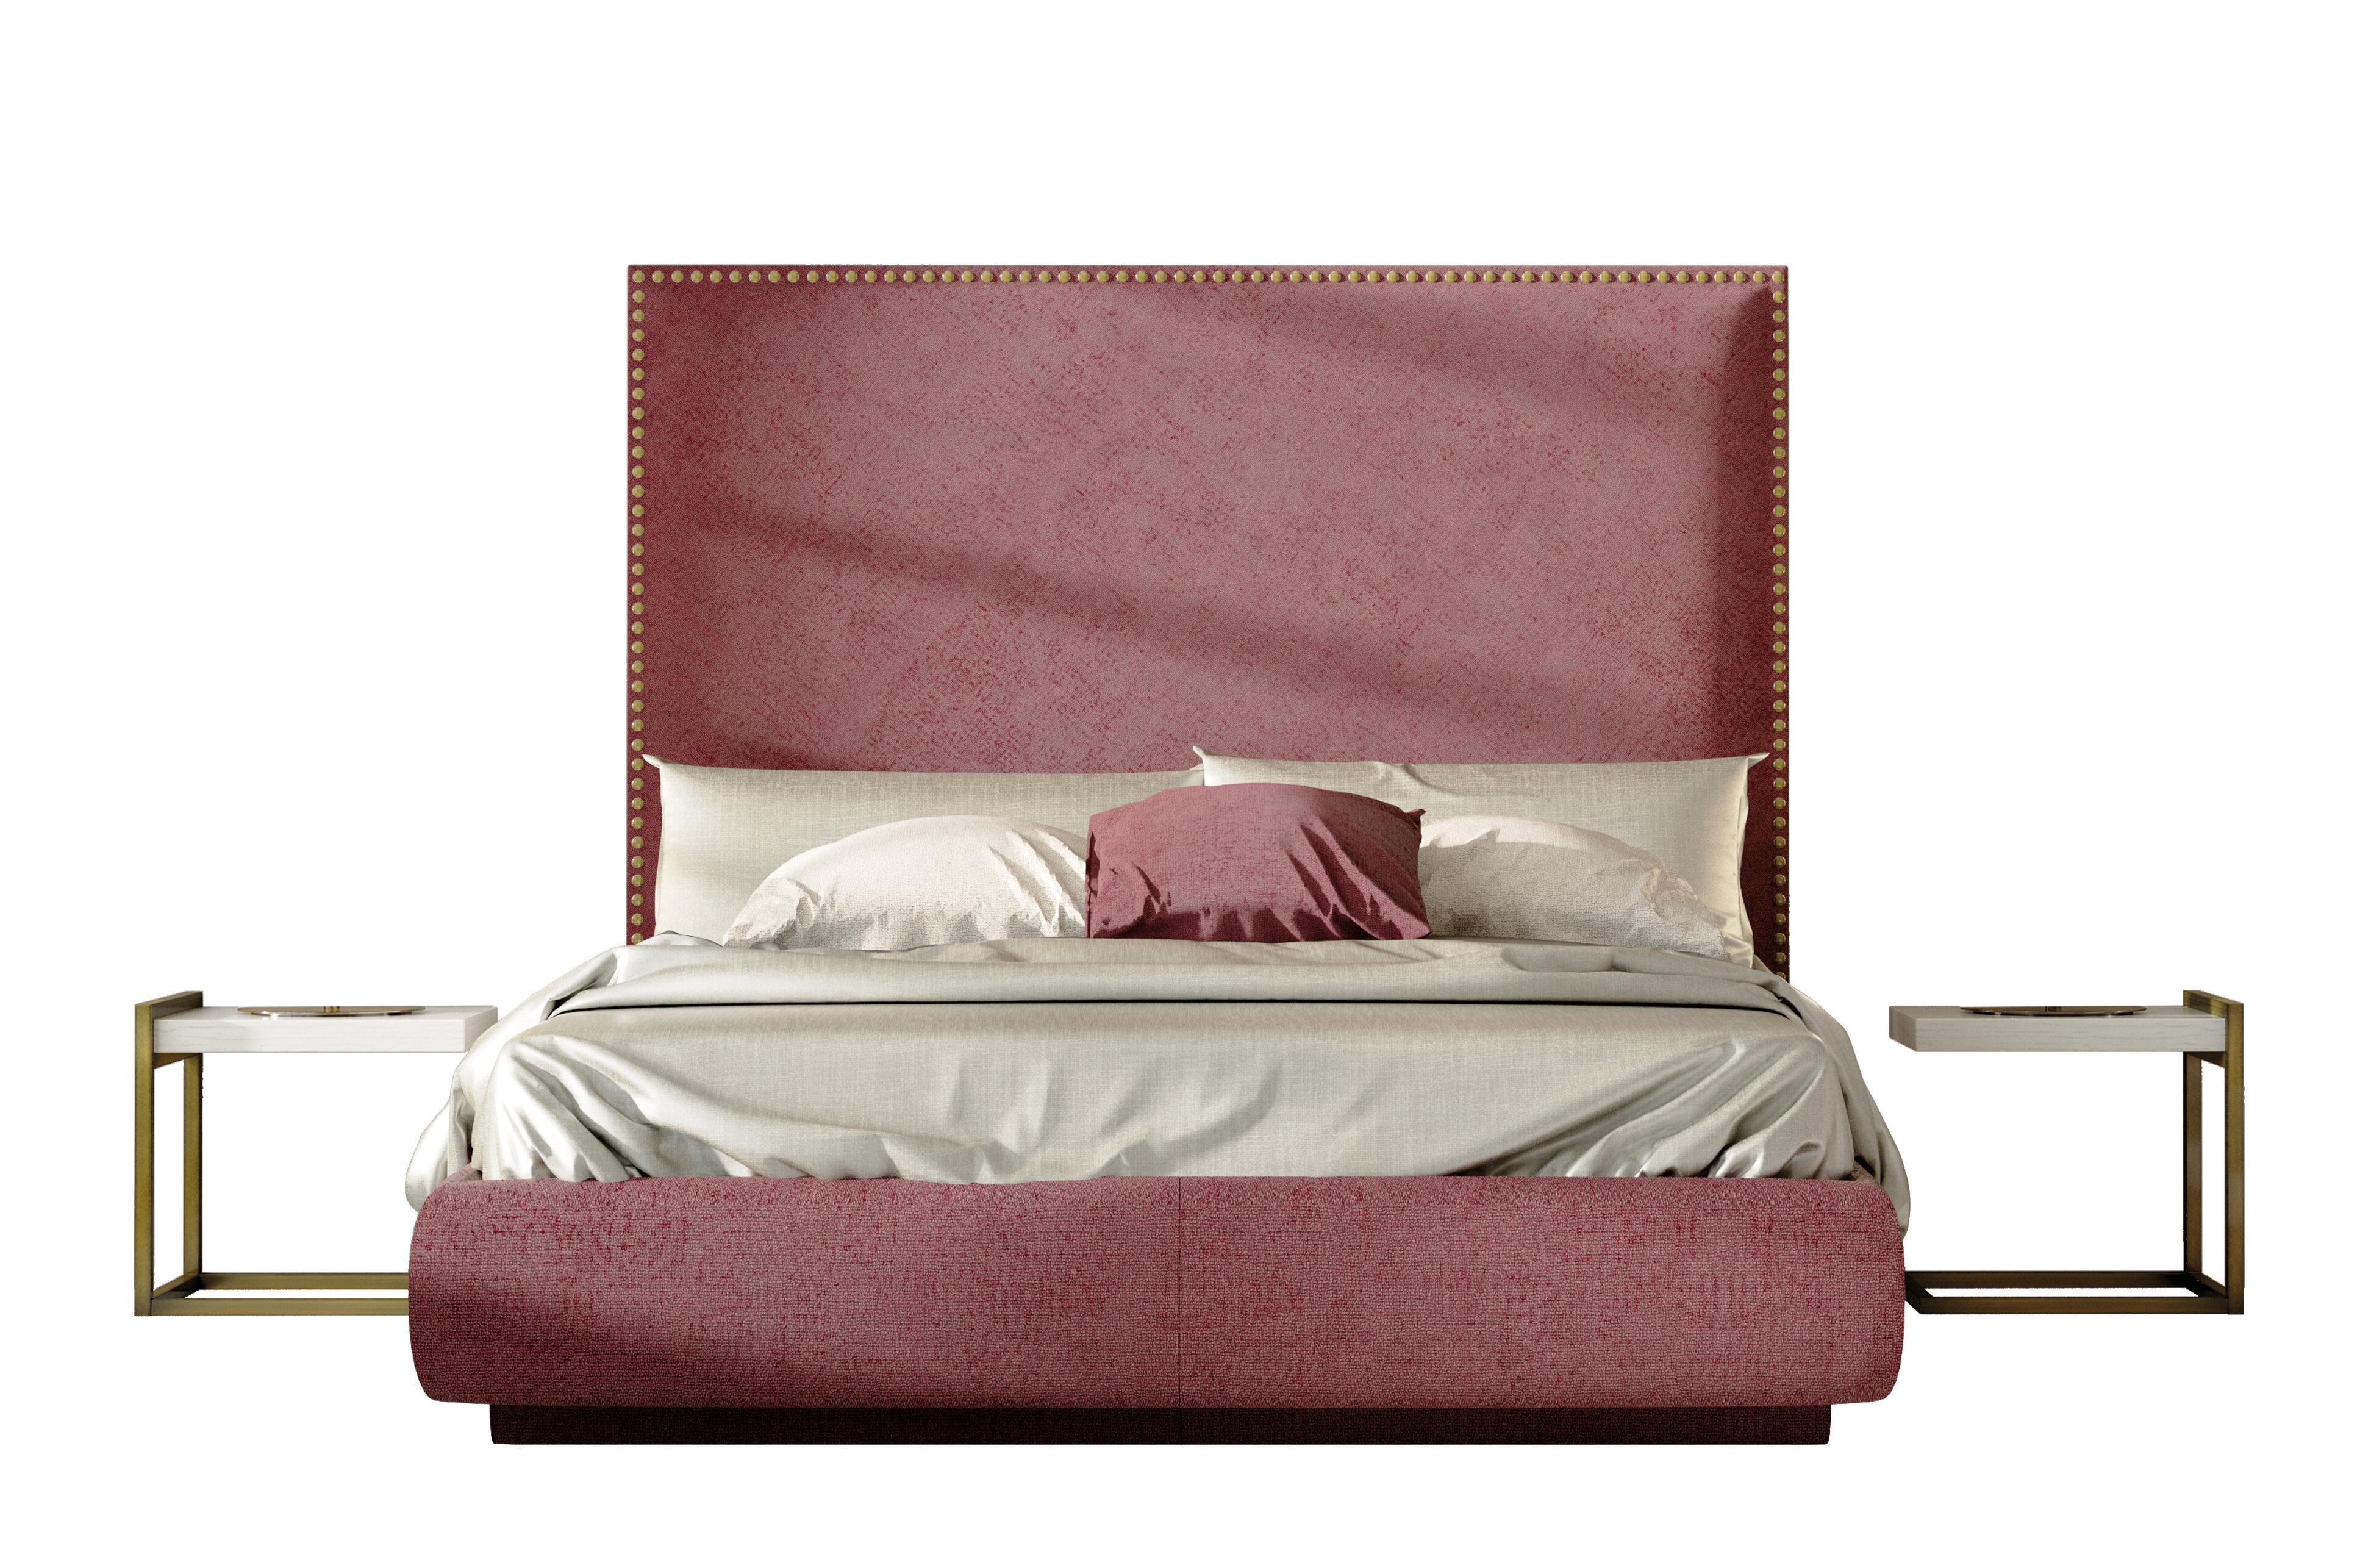 House Of Hampton Eldorado Upholstered Standard Bed Wayfair Ca